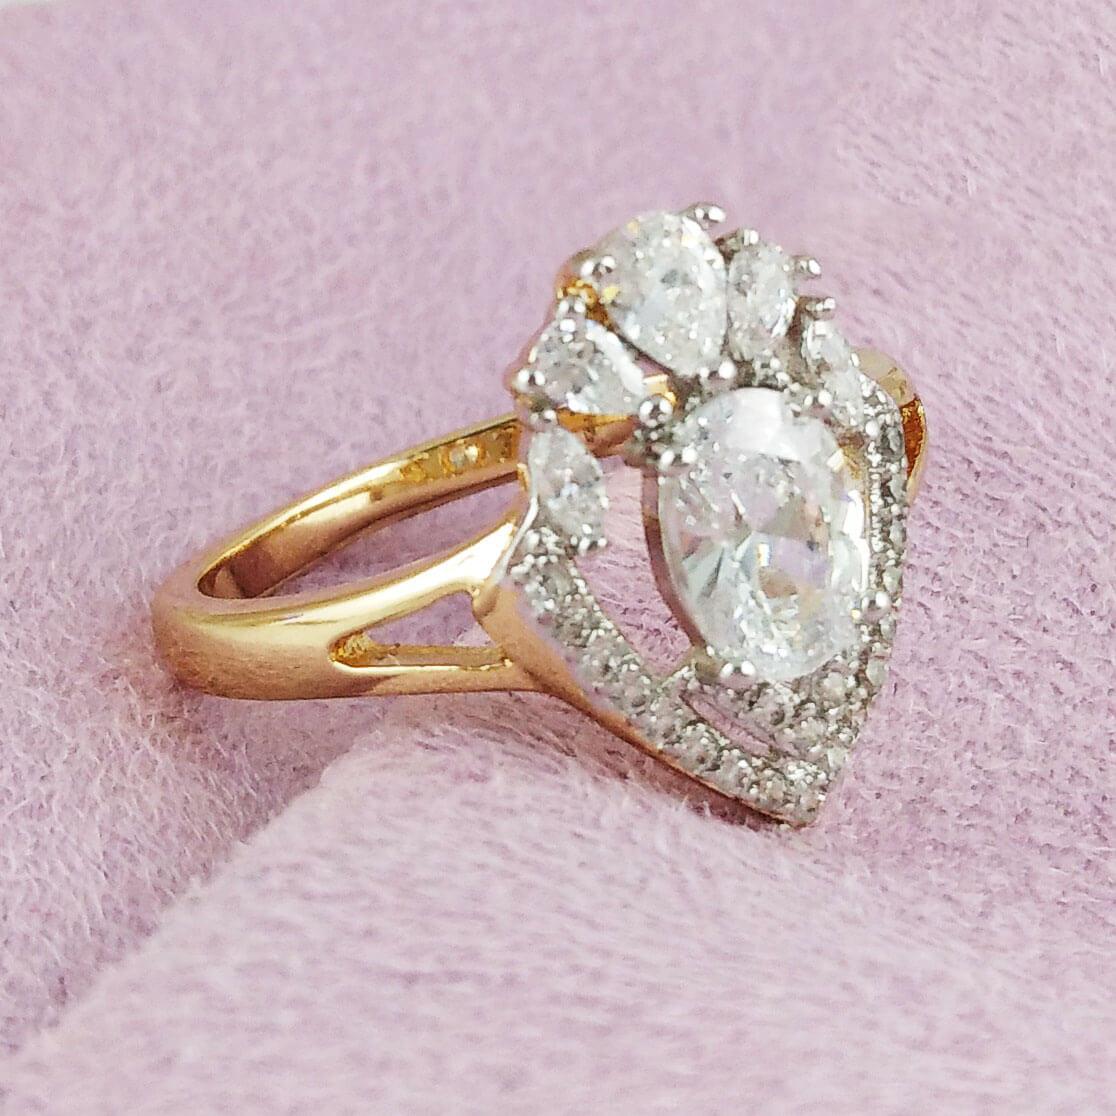 Кольцо Xuping Jewelry размер 19 Императрица медицинское золото позолота 18К + родий А/В 2-0170